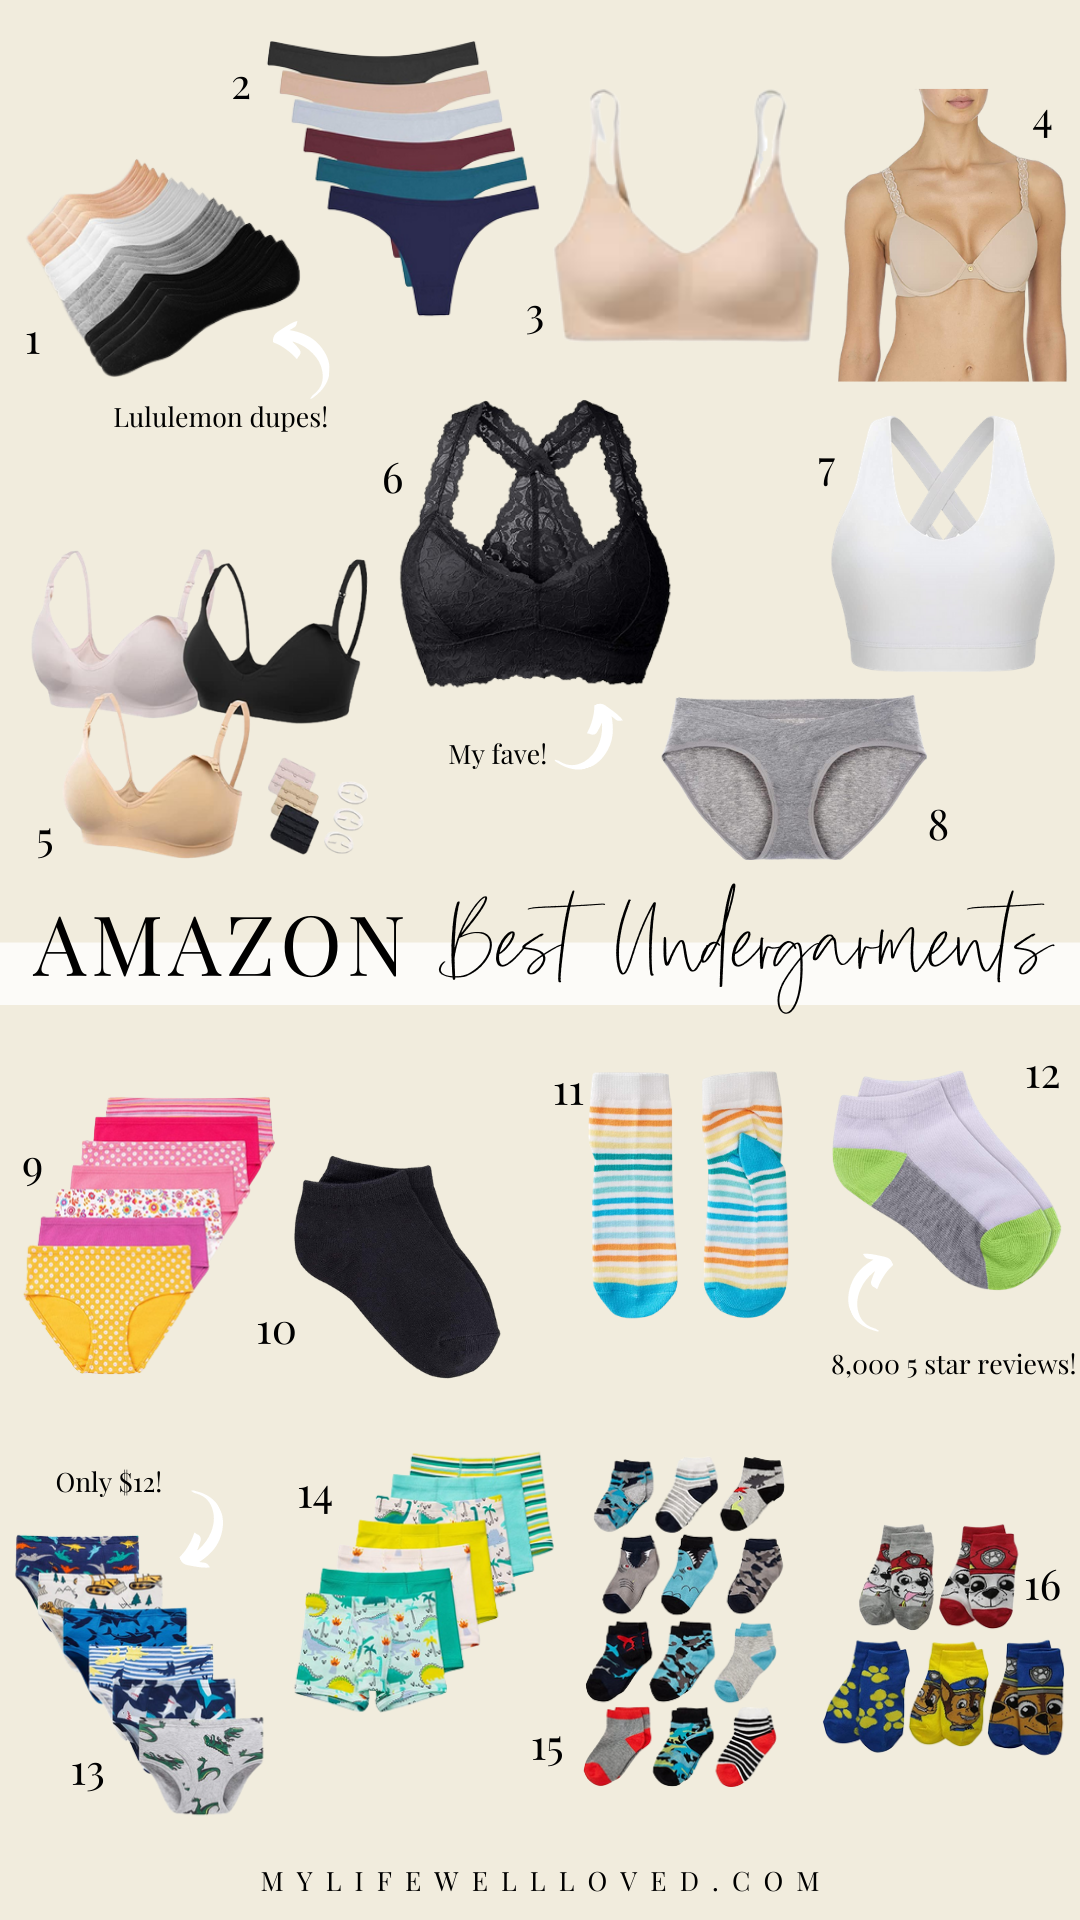 Amazon best undergarments for women